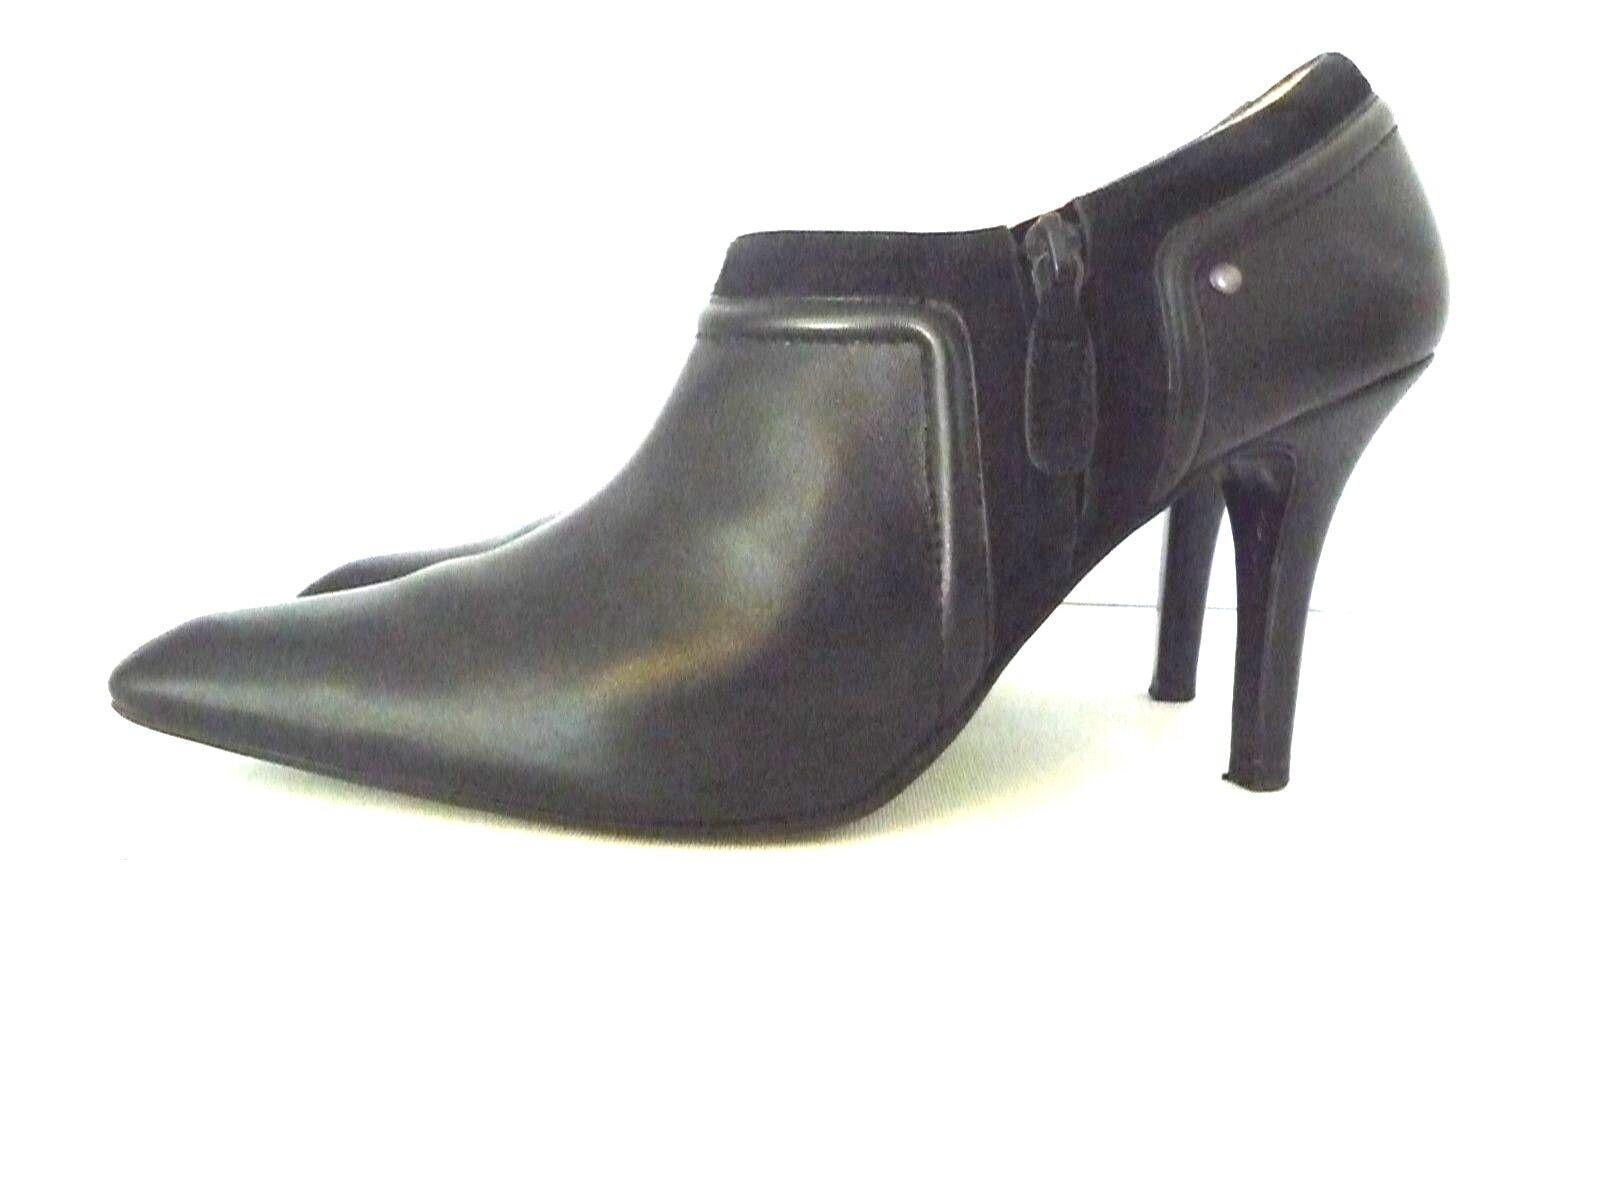 COLE HAAN Women's Black Black Black Leather Side Zipper Heel shoes Size 11 B Made in Brazil 14cbfb